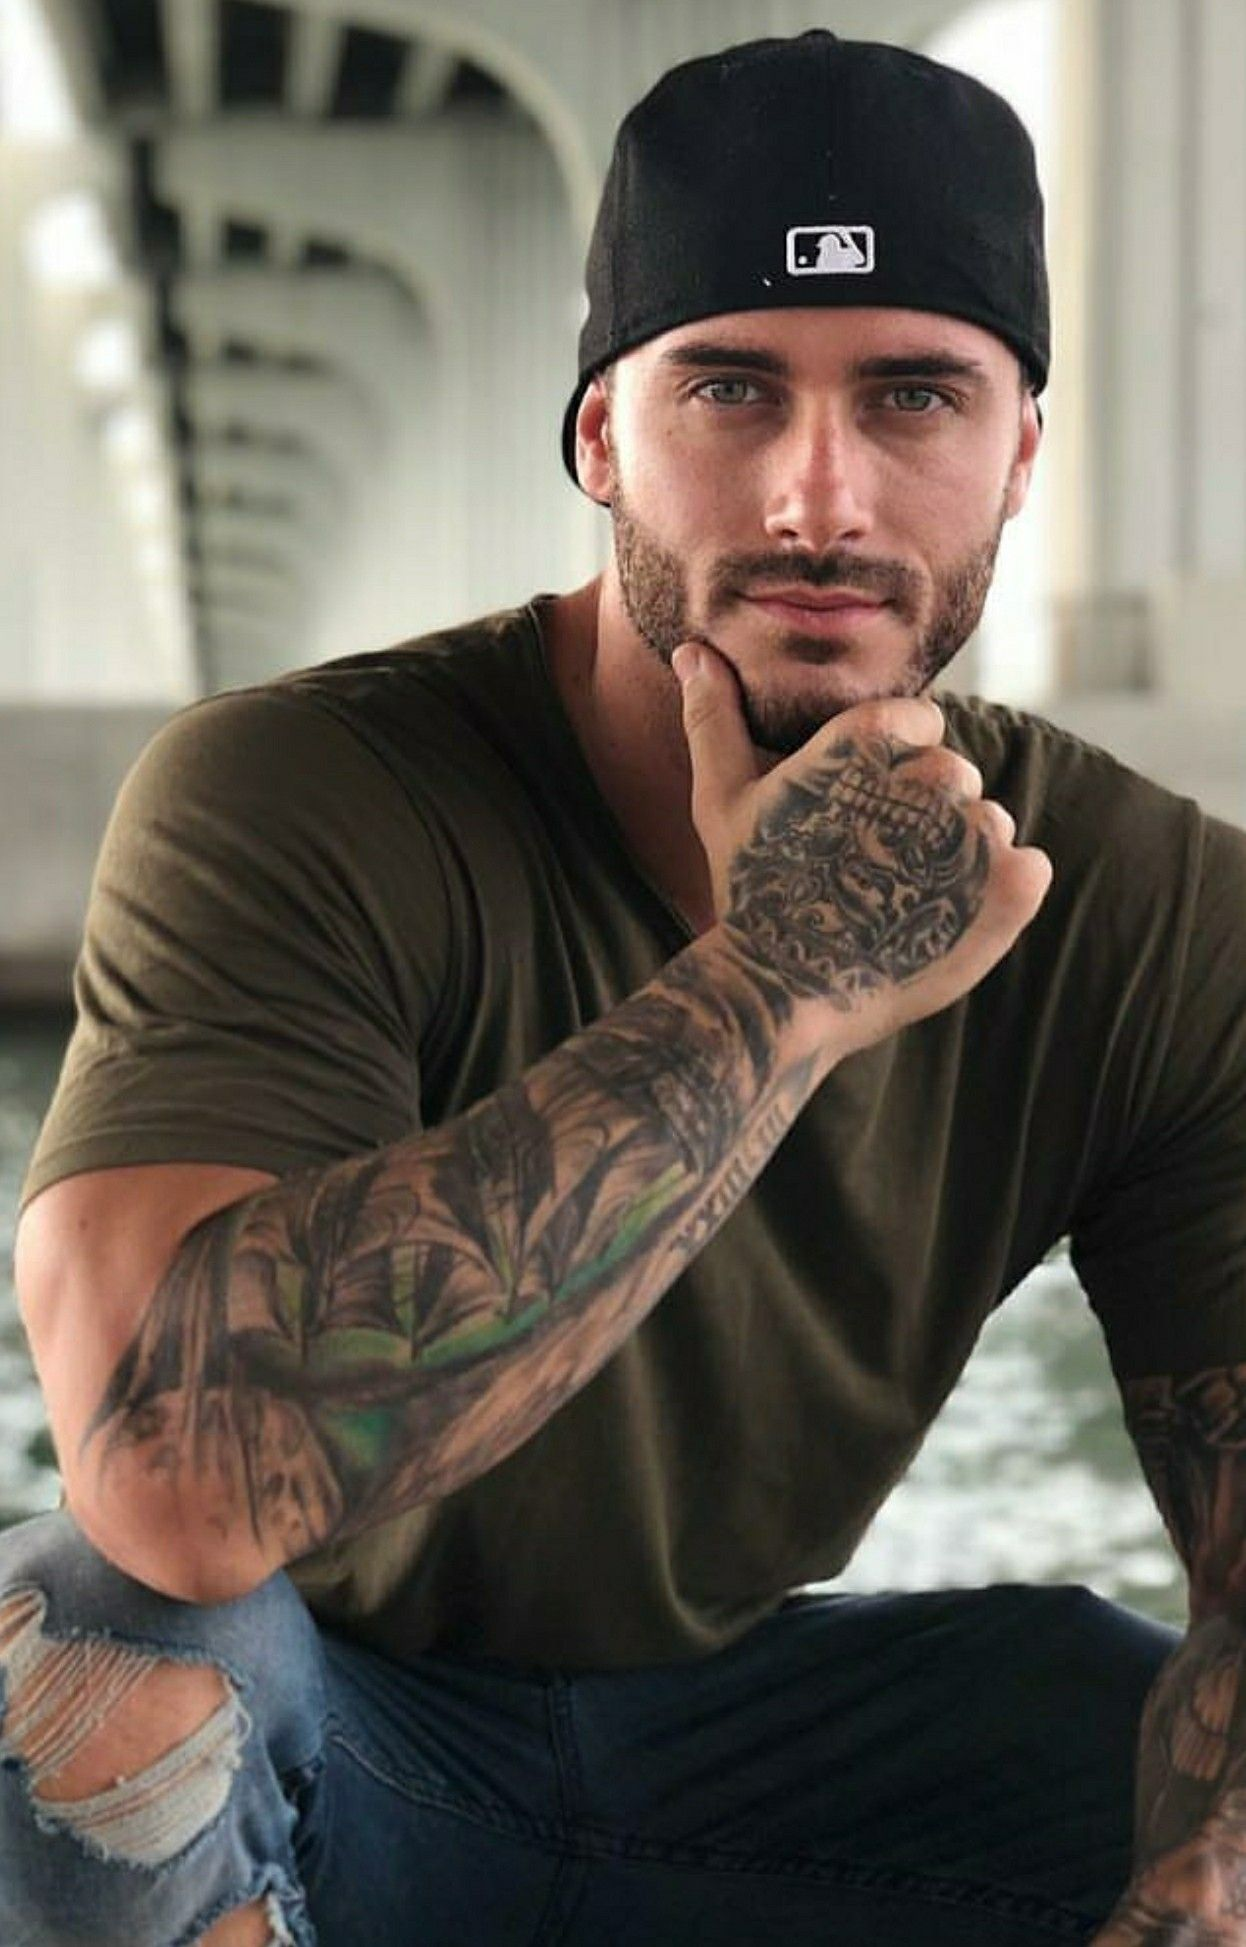 Pin by nicky nicky on tattoo boys pinterest handsome eye candy